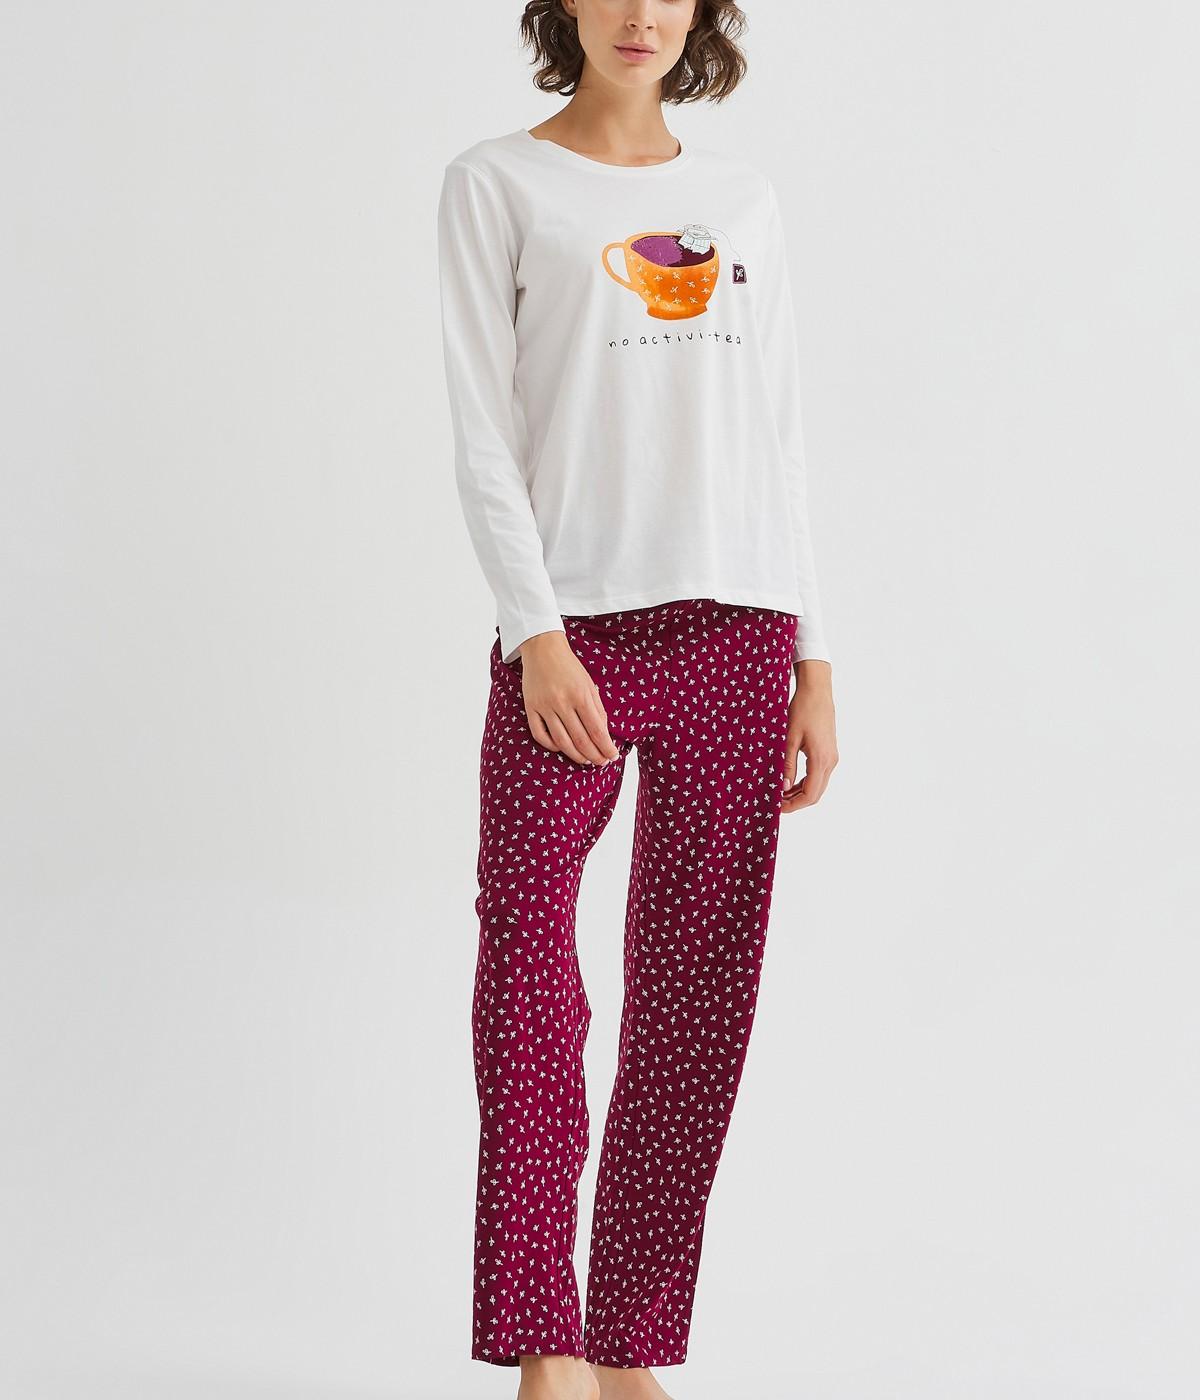 Set Pijama Activitea